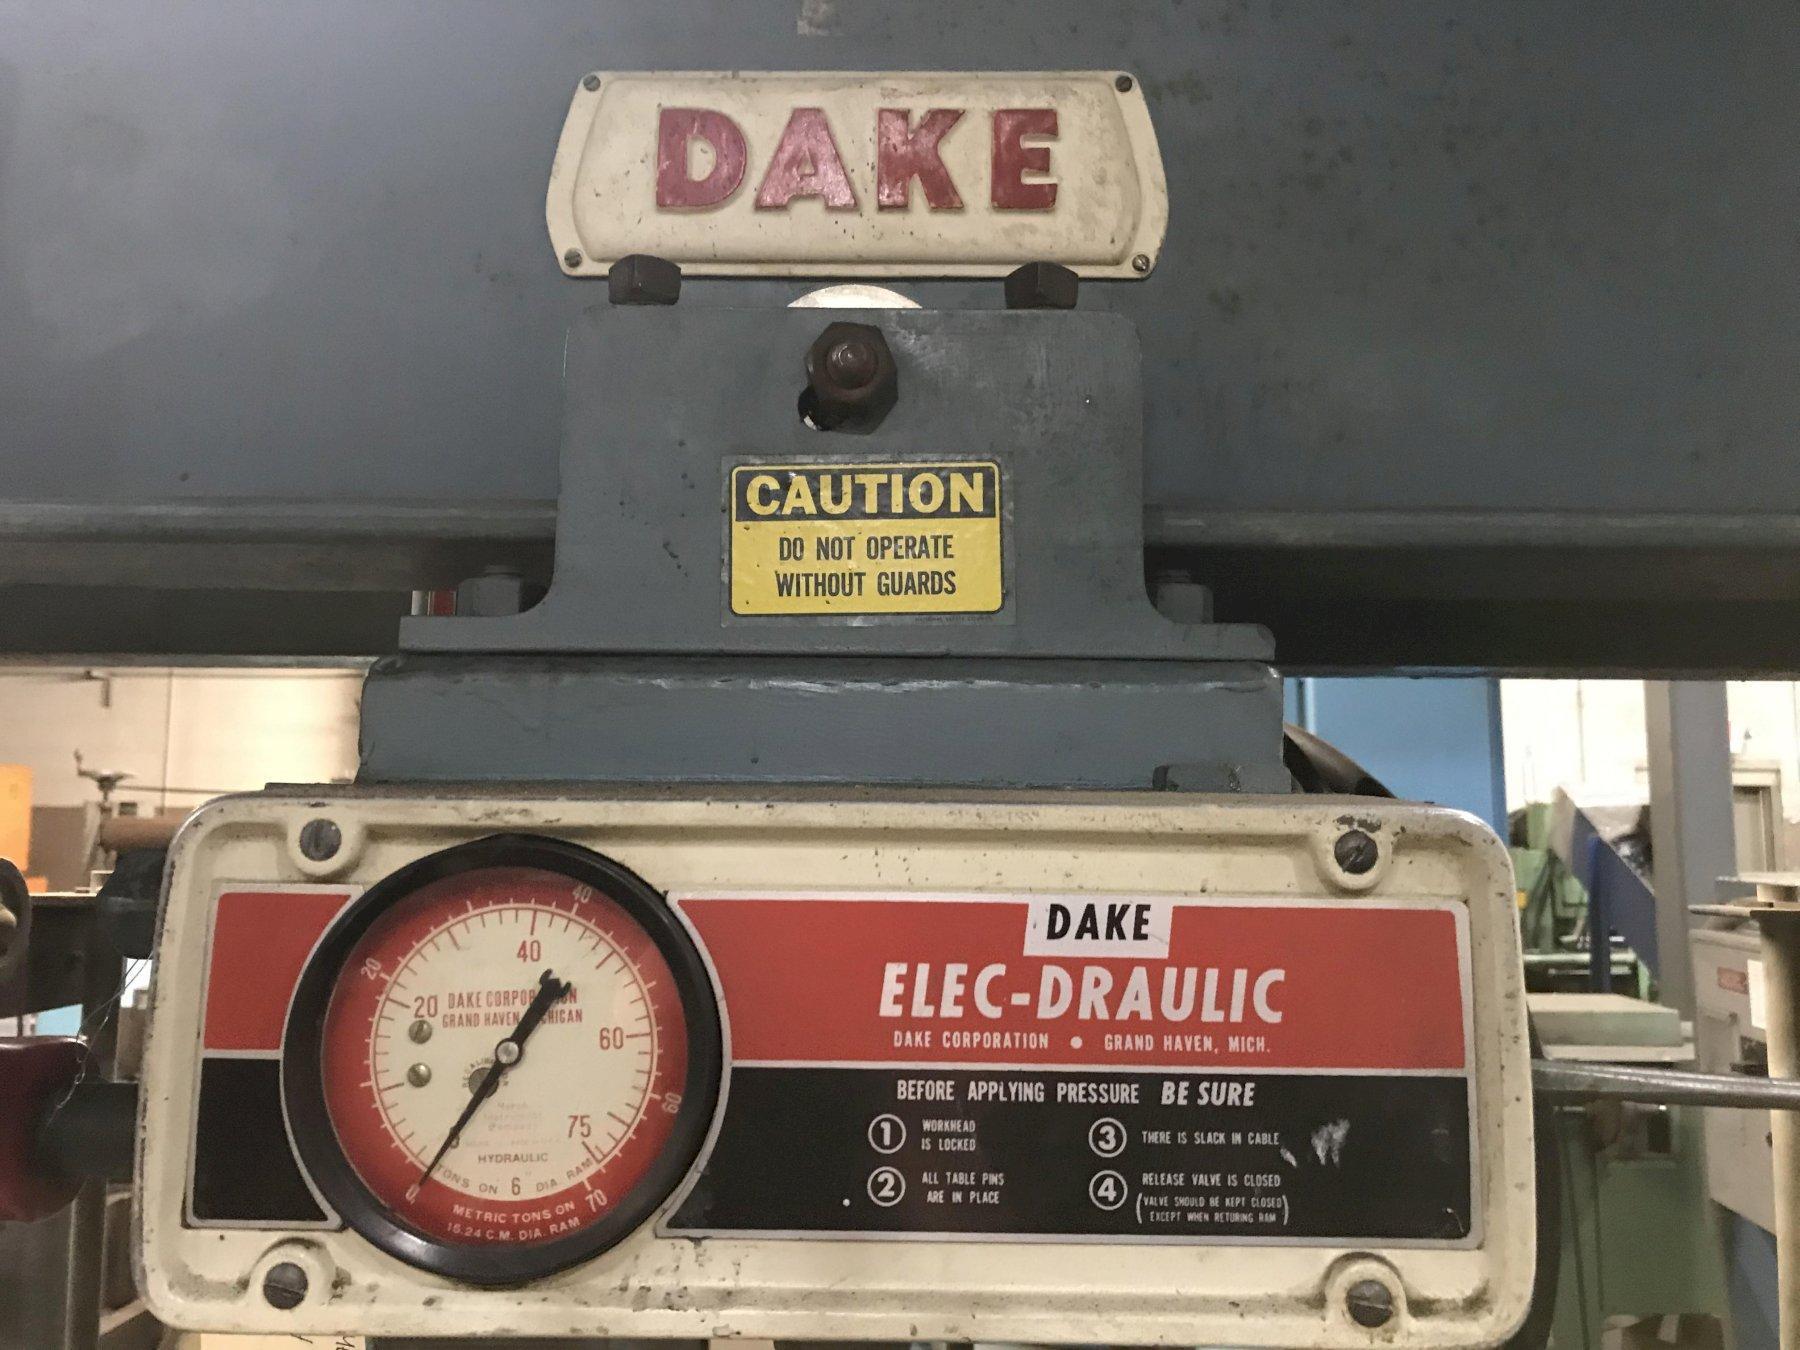 USED DAKE ELEC-DRAULIC H-FRAME PRESS, Model 5-264, 75 ton, Stock No. 10383